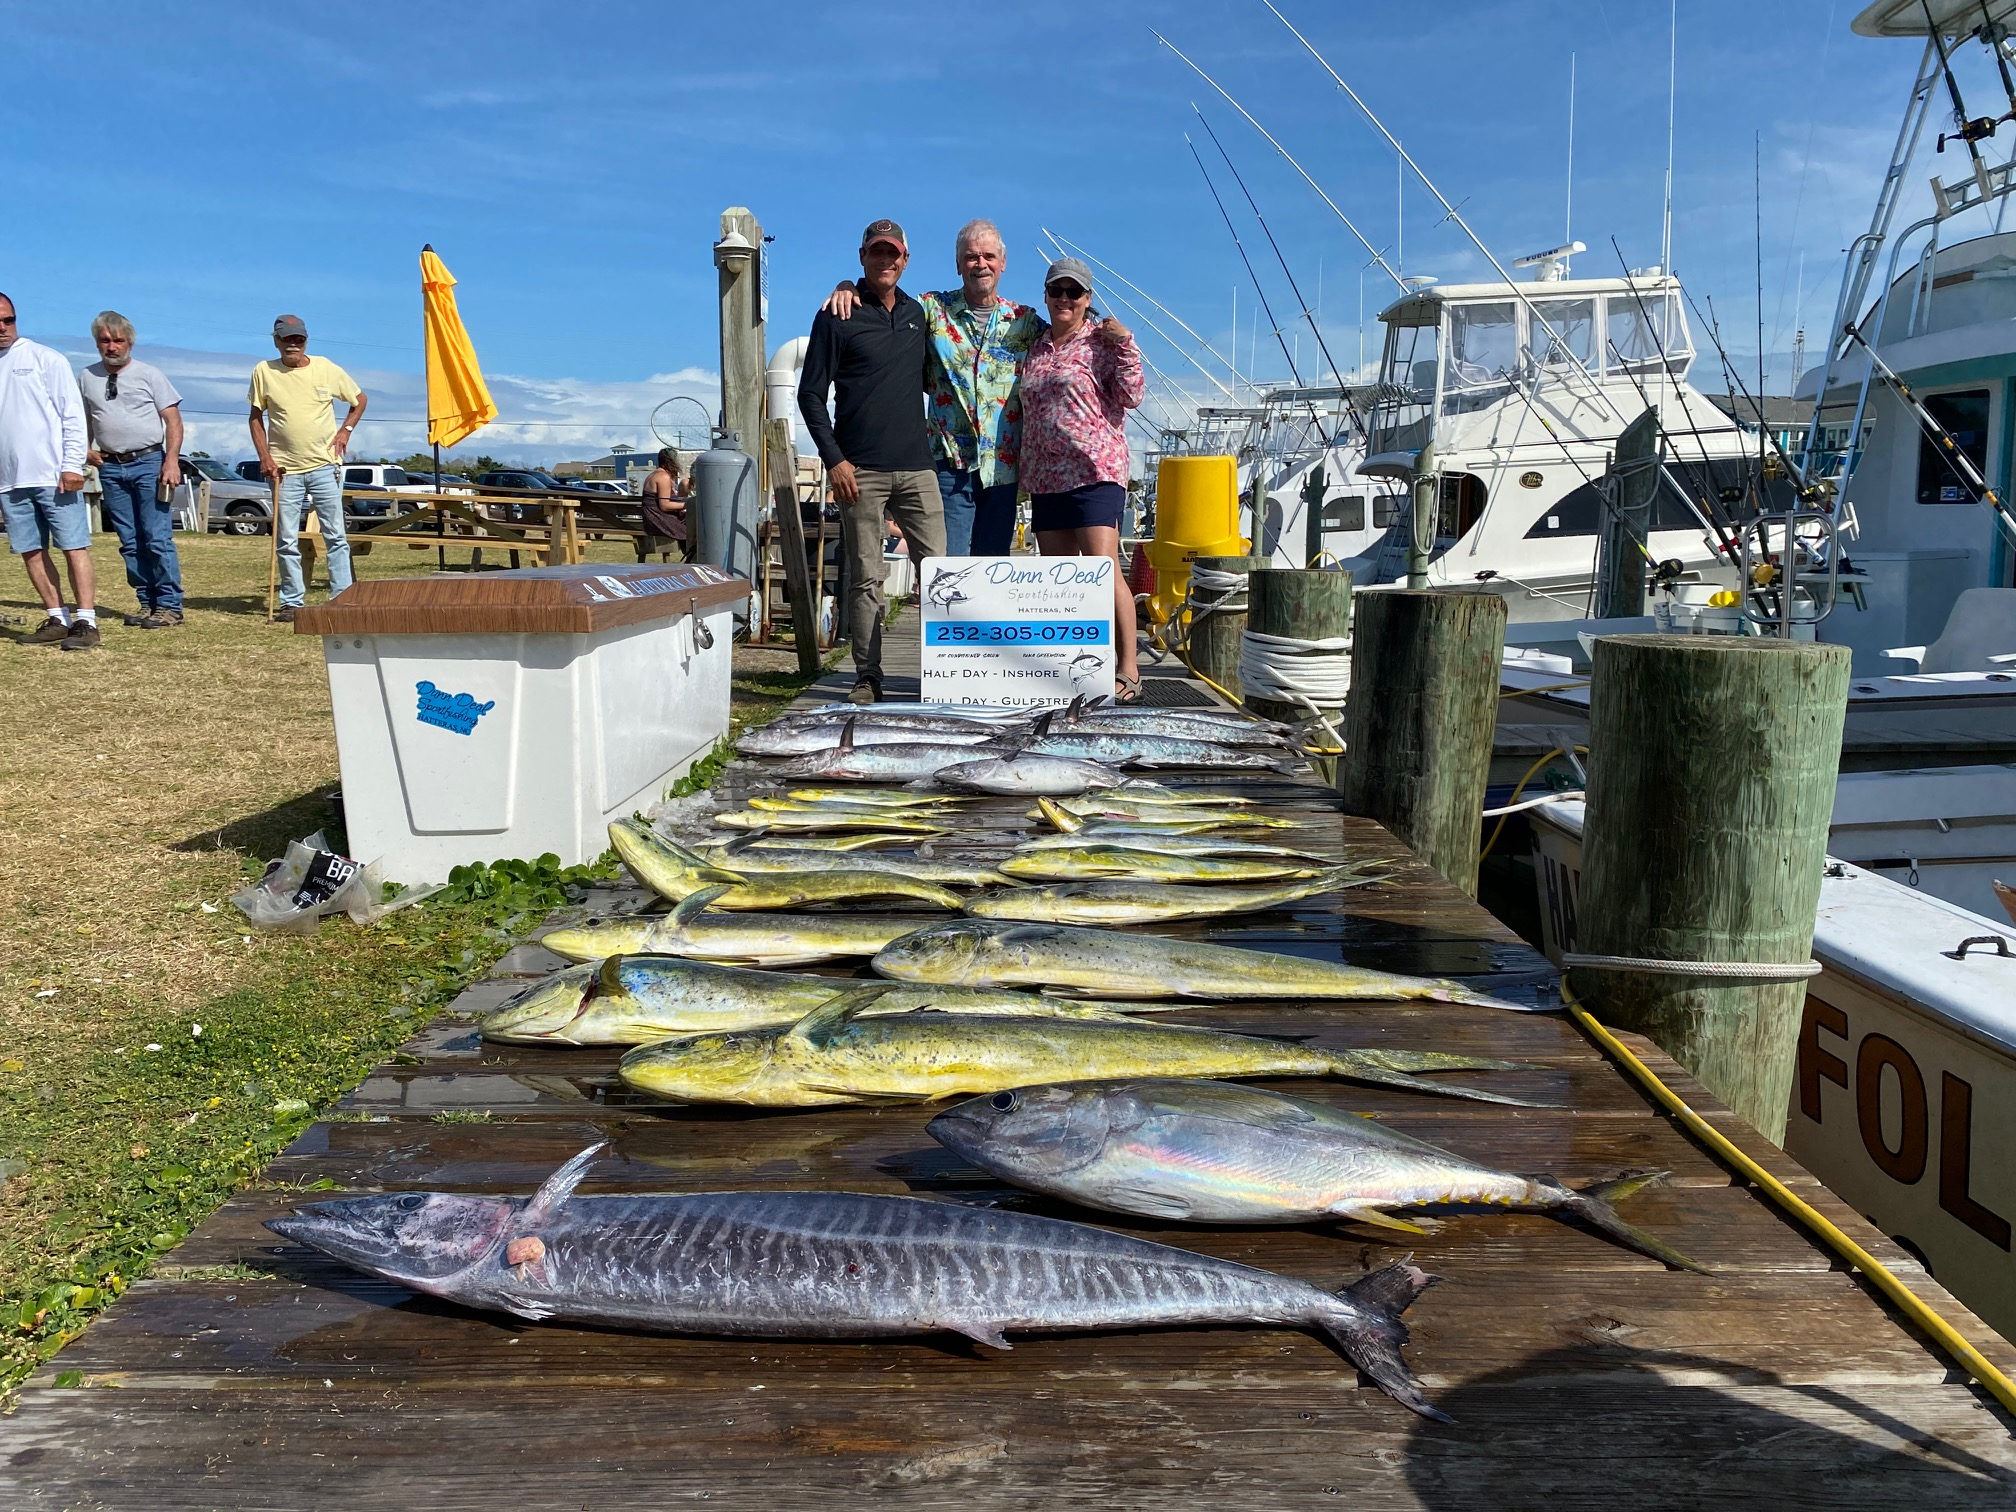 Harper's Folly Dunn Deal Teach's Lair Hatteras Offshore Fishing